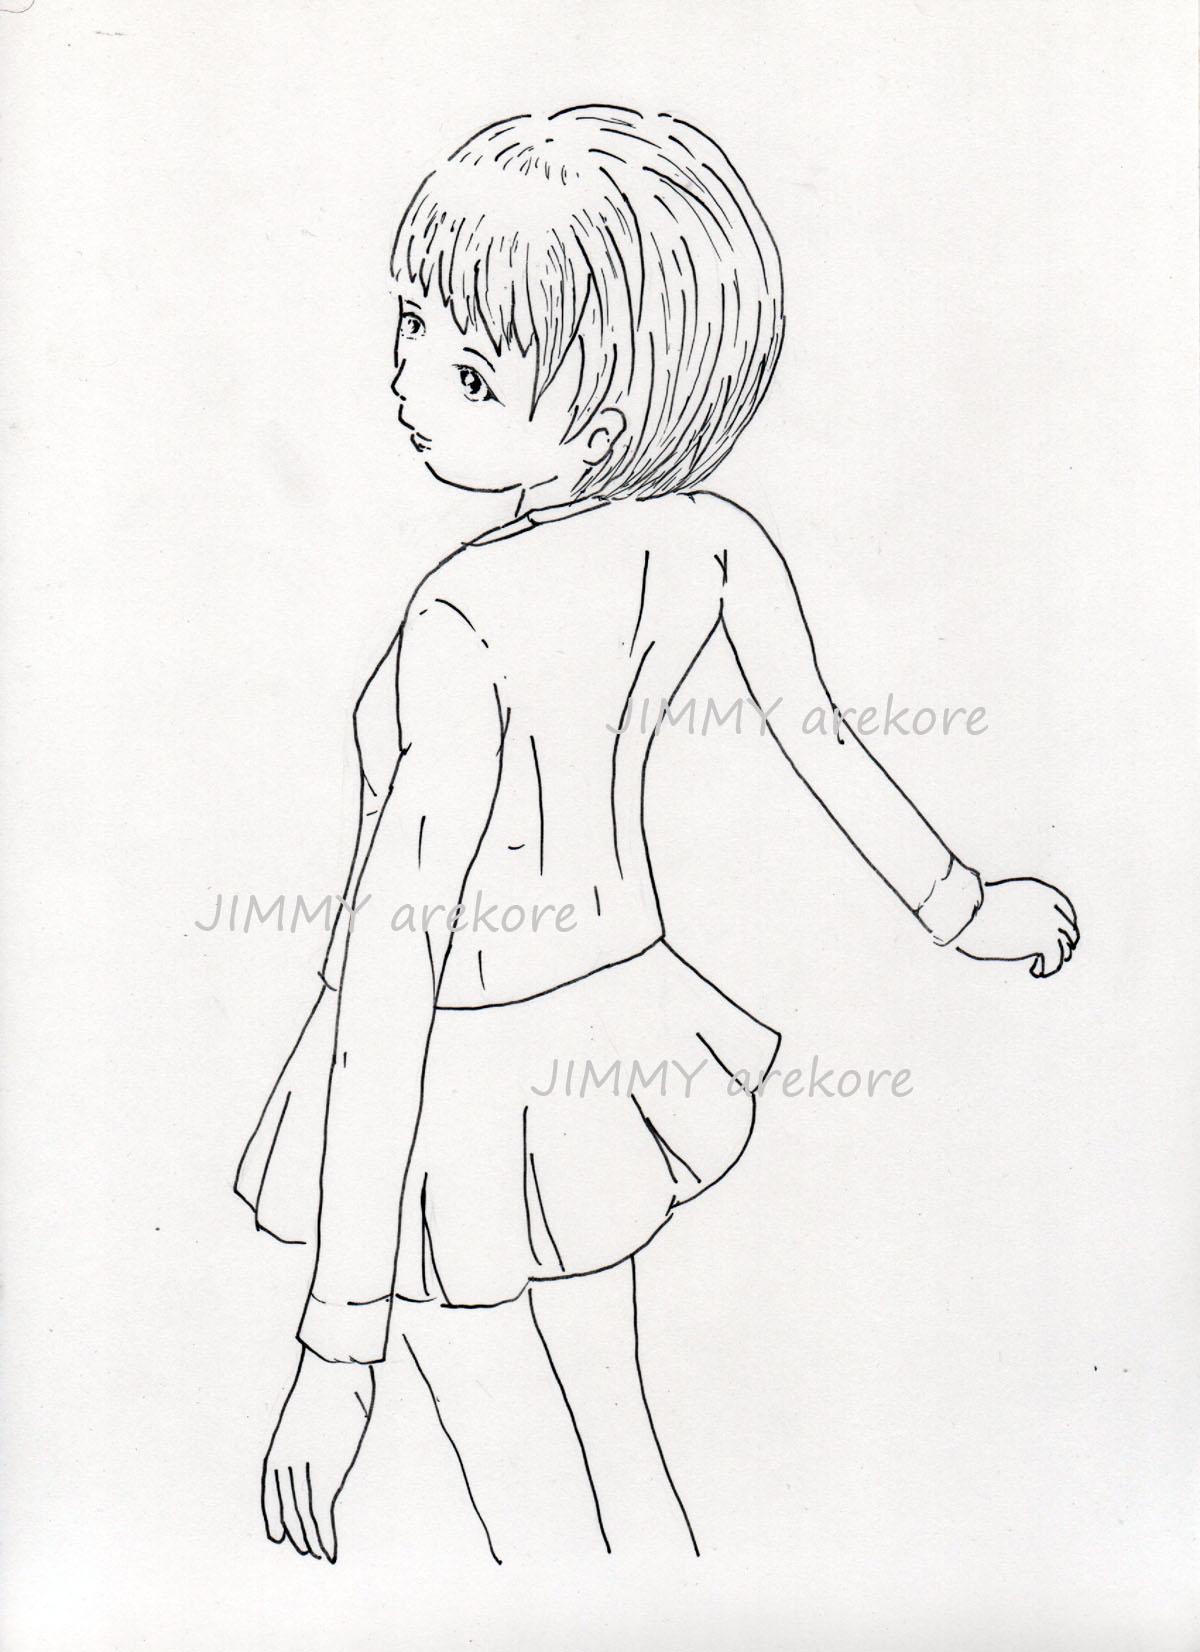 01-furimuita-shoujo-LINE.jpg